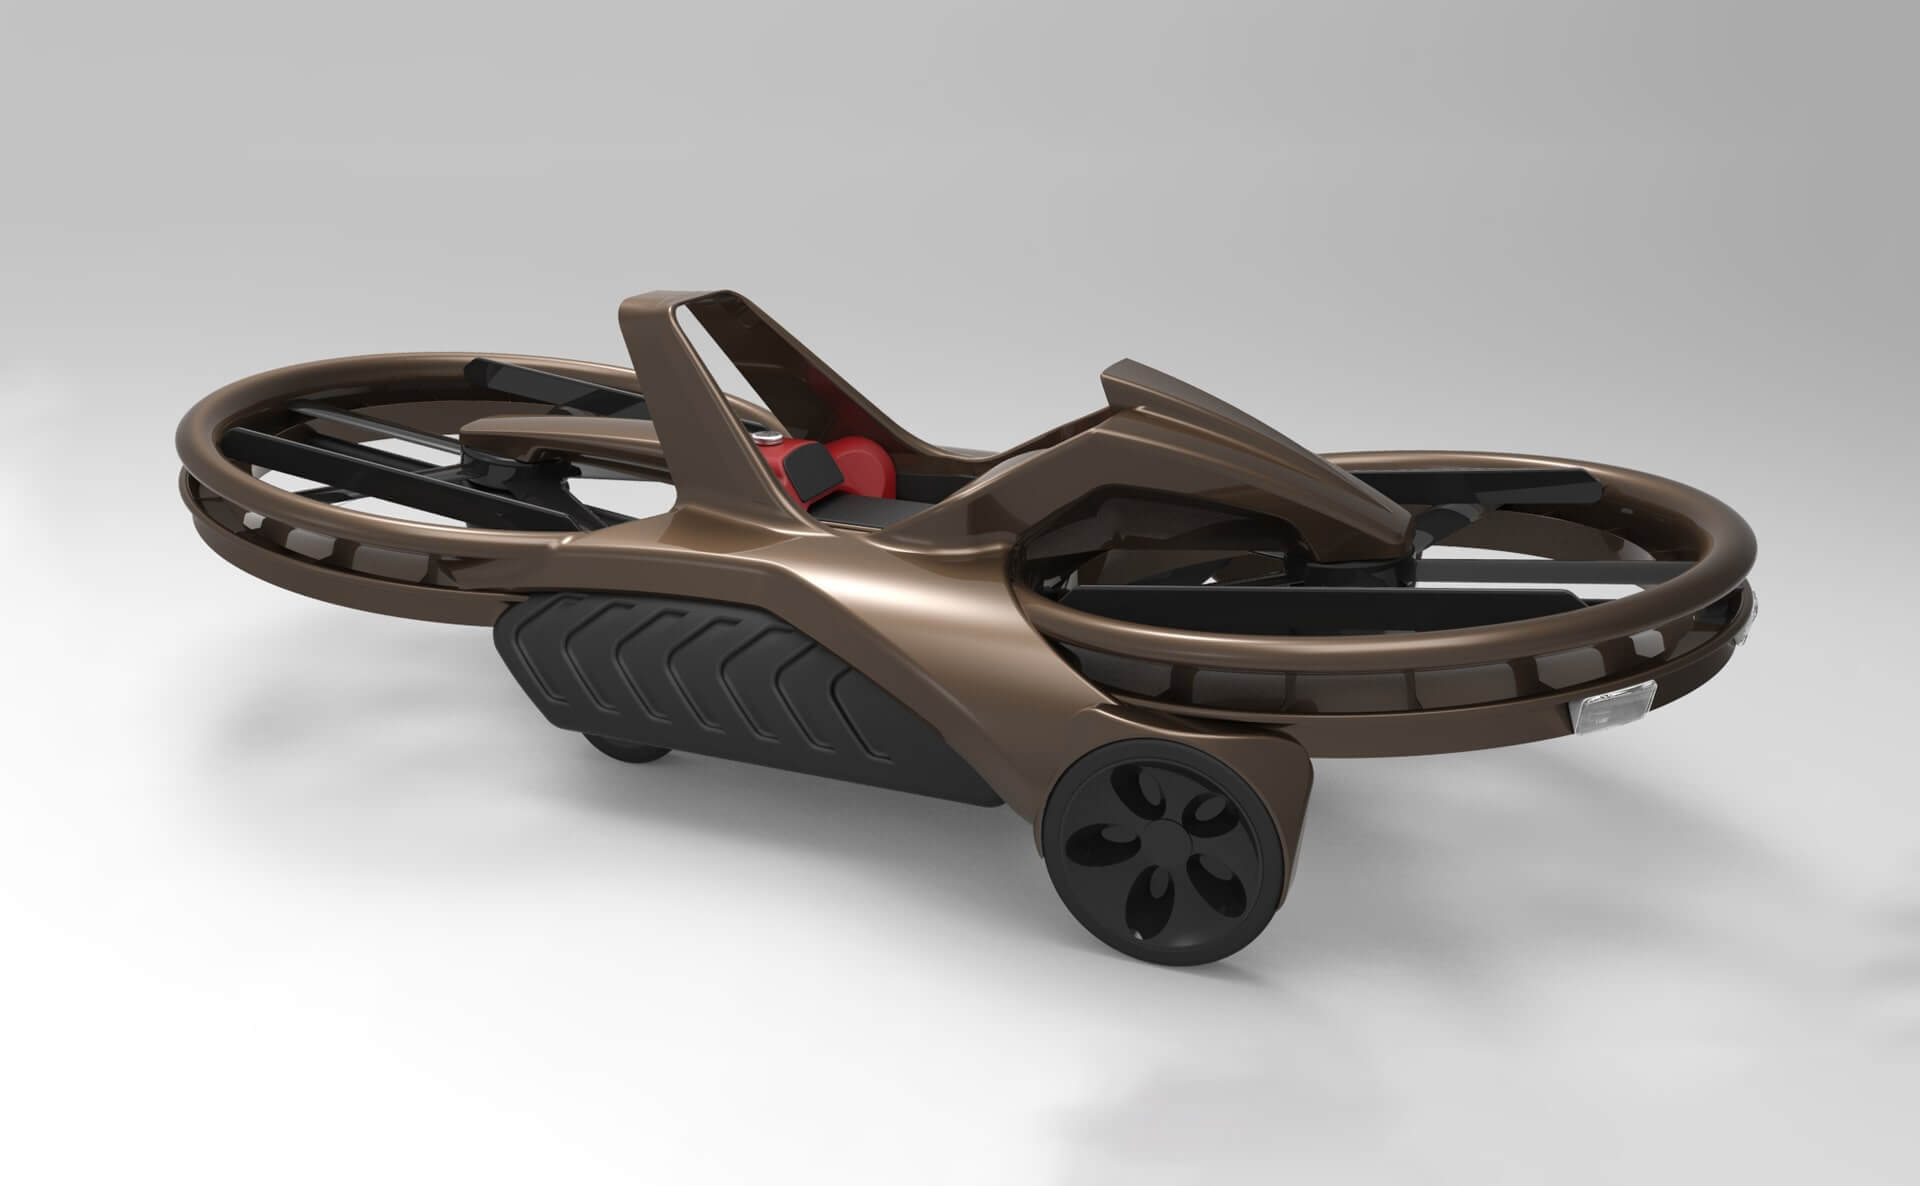 The Aero-X